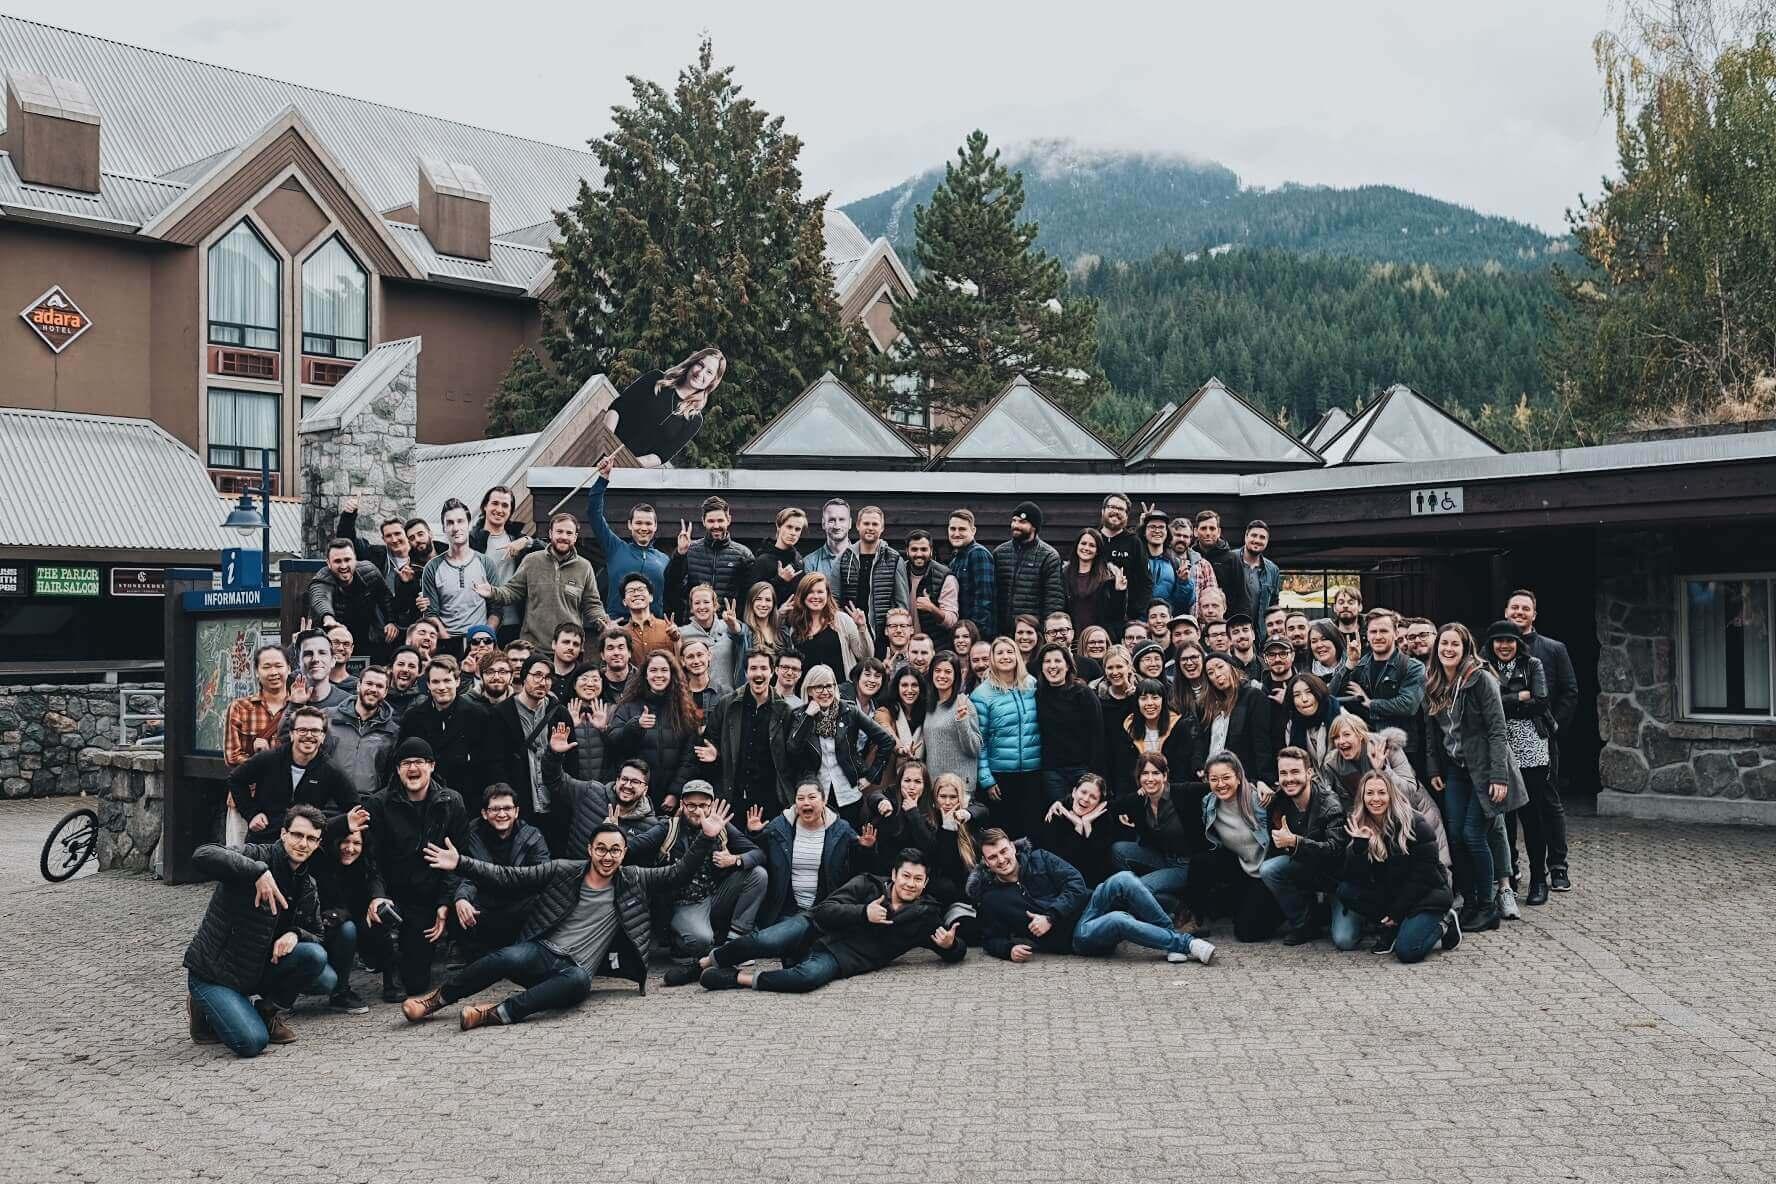 The MetaLab team at Remote Summit 2018